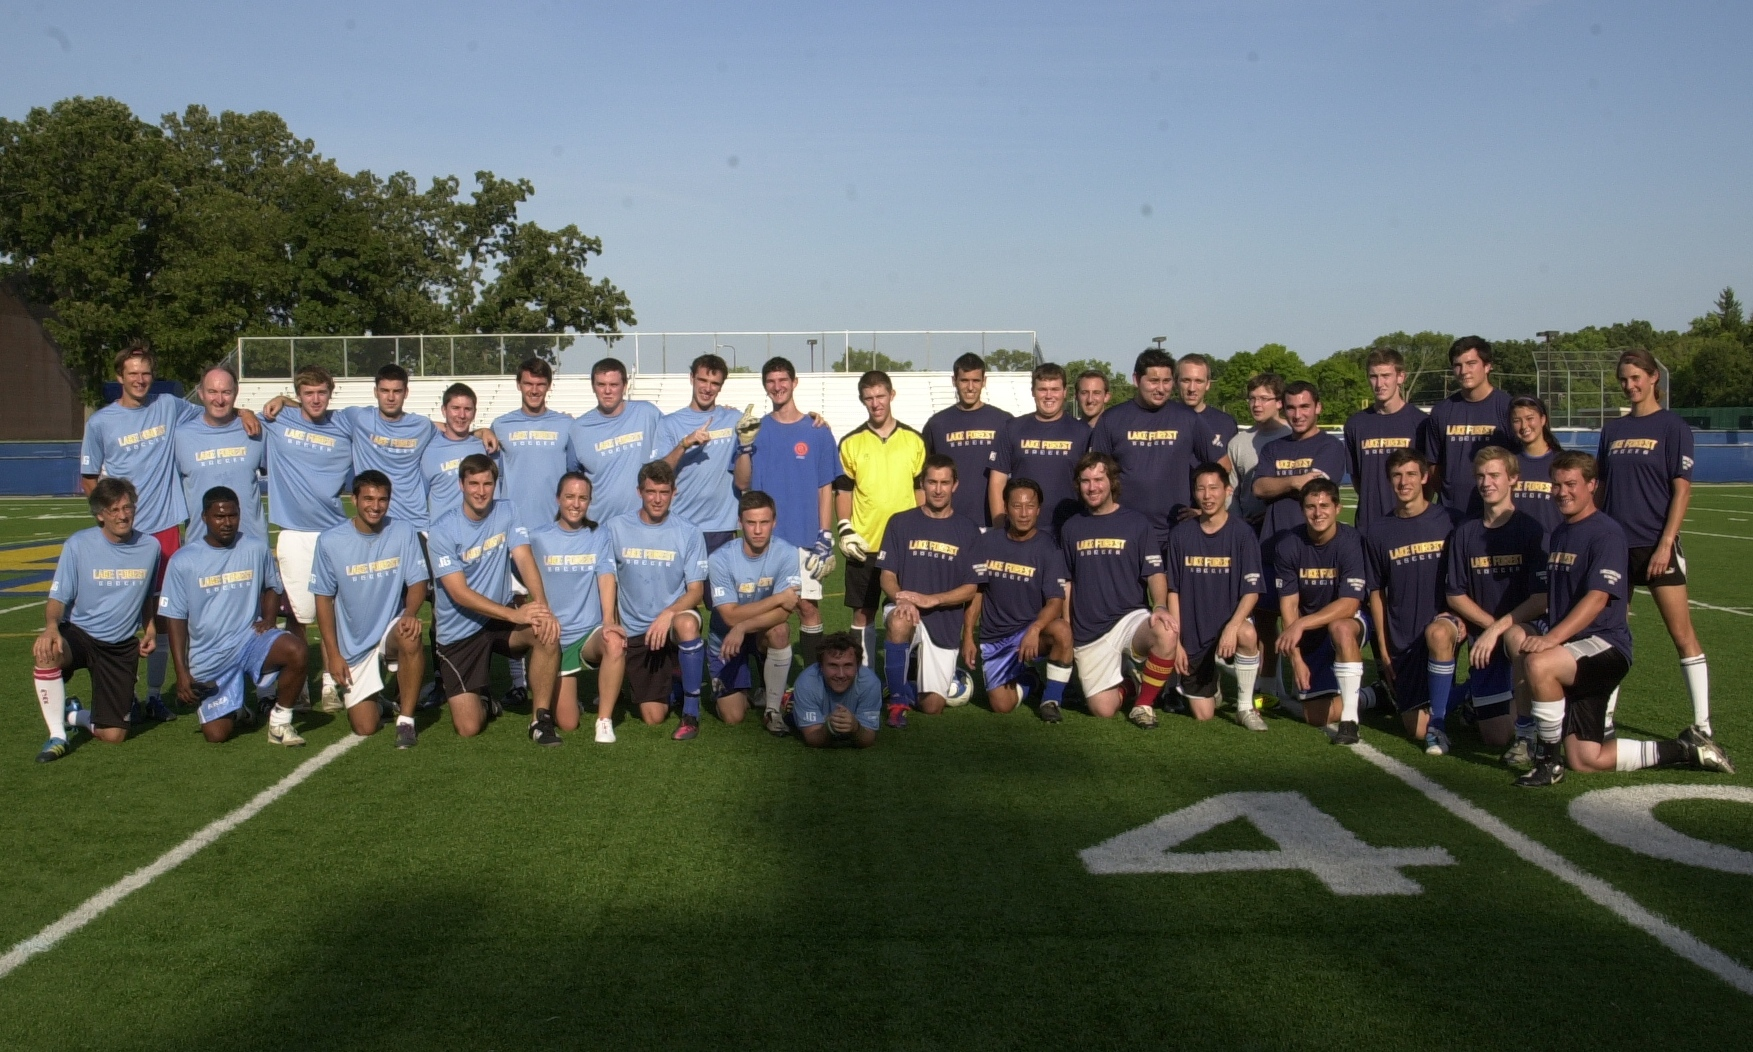 Alumni Soccer Game 2012_alumni_game_team_pic 1